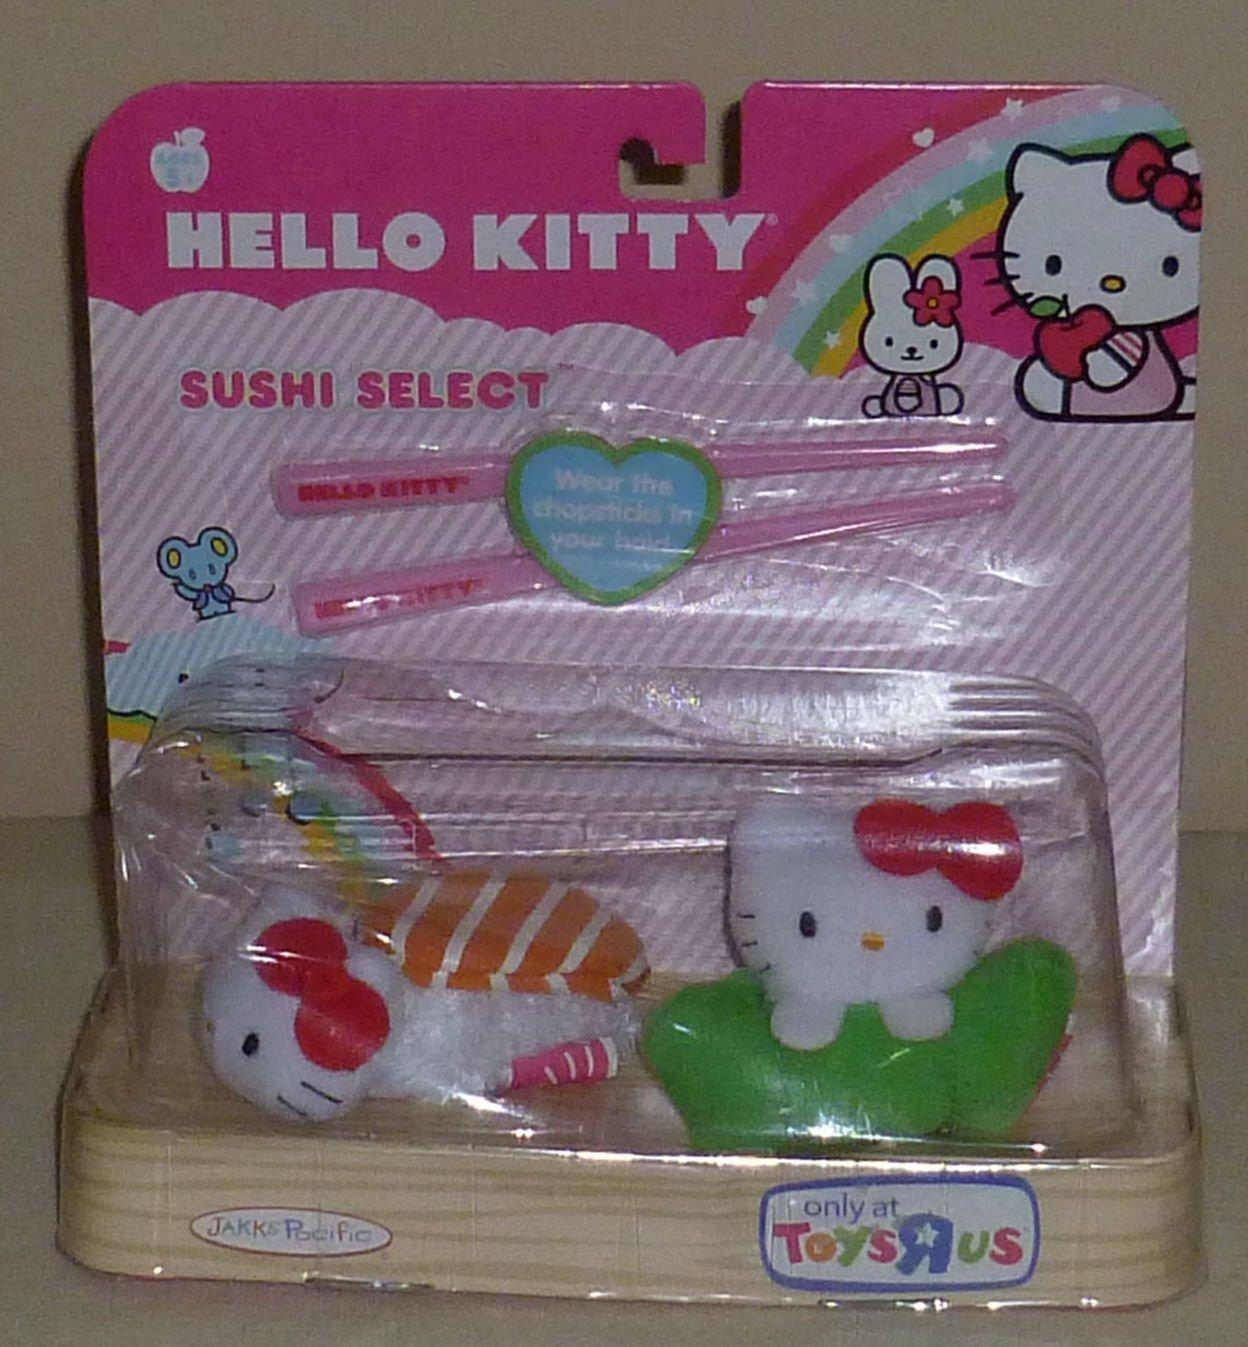 Hello Kitty Toys R Us : Hello kitty sushi select toys r us exclusive nip htf